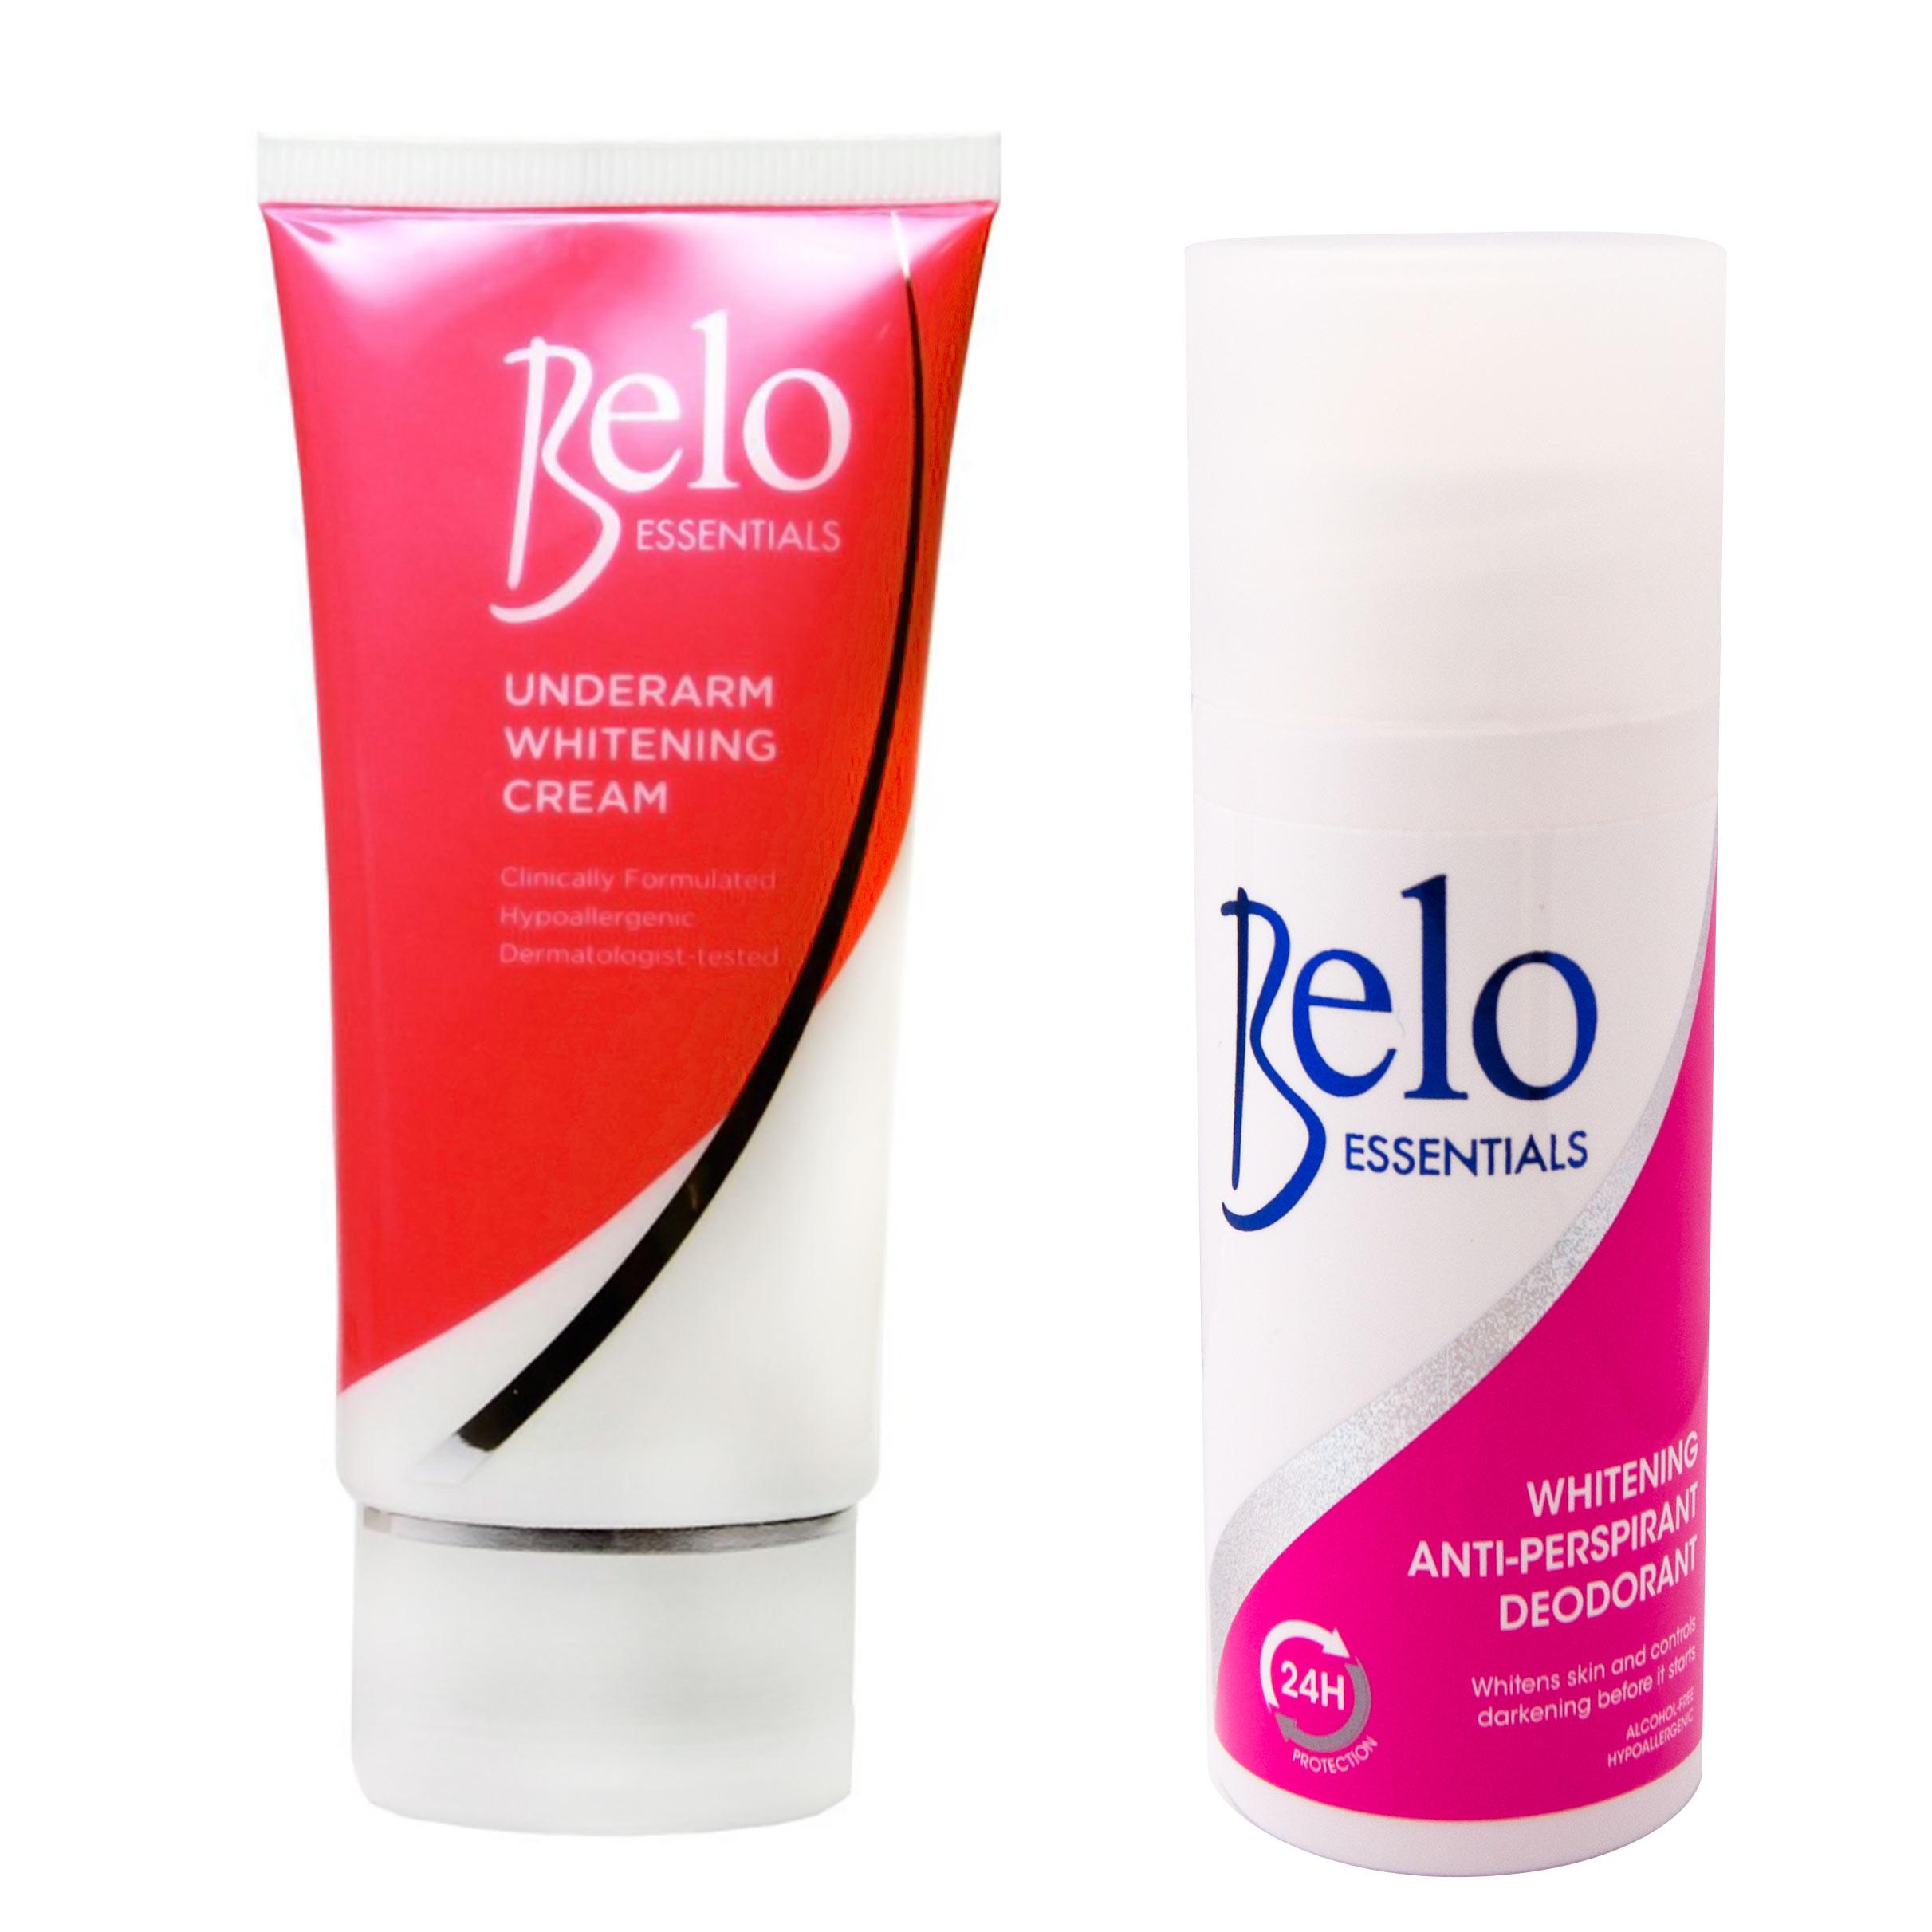 Fashion style Deodorant best creams for lady